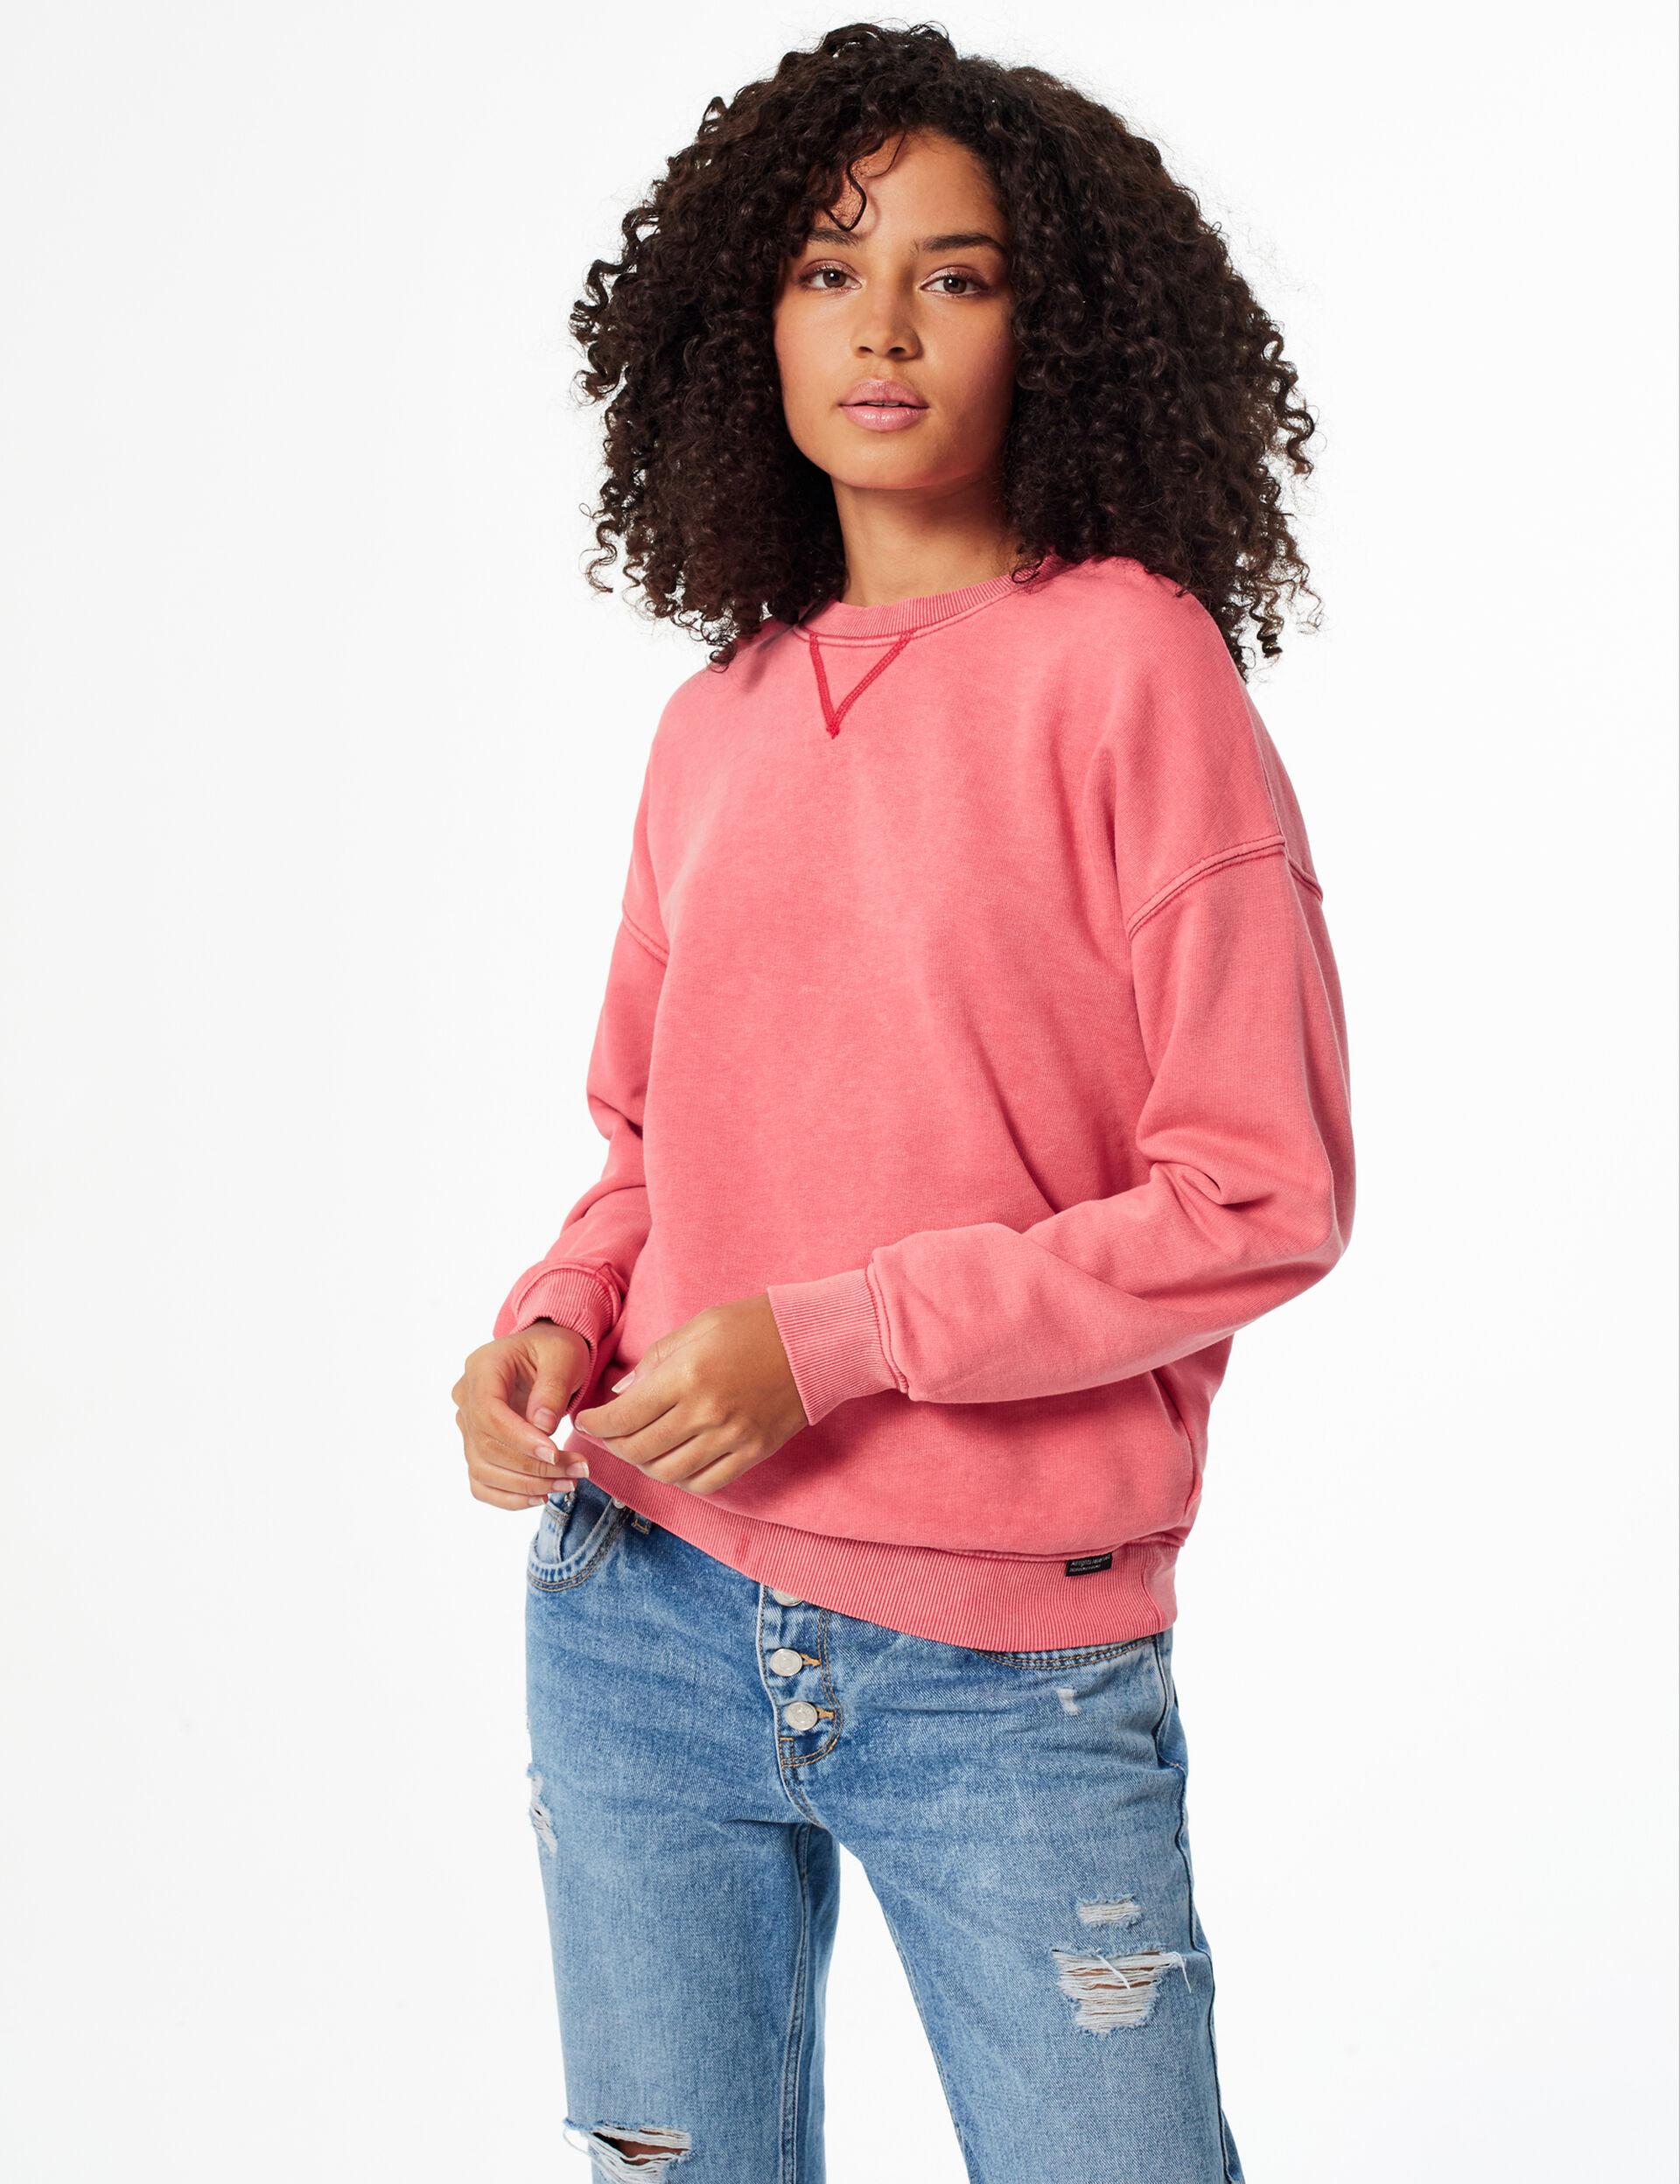 Sweatshirt with inserts